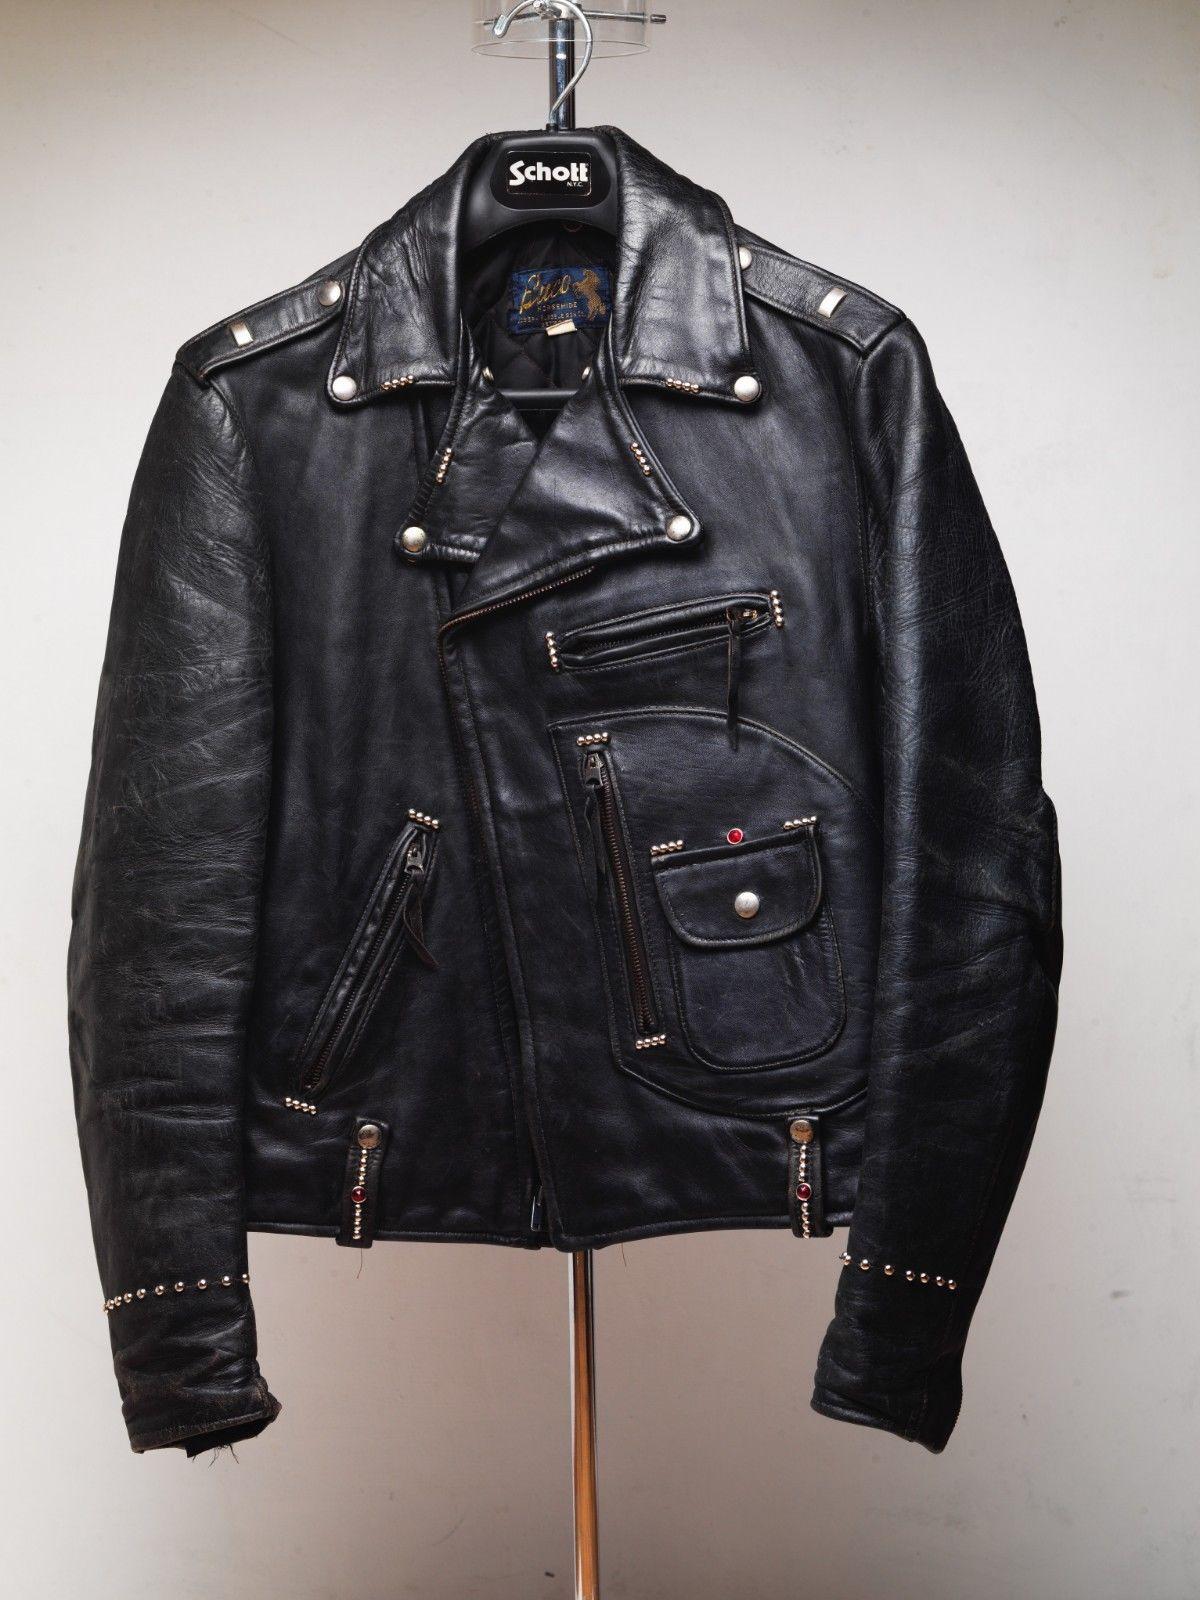 Vintage Buco J 24 Horsehide Leather Jacket 40 Motorcycle D Pocket 1950 S Ebay Jackets Leather Jacket Motorcyle Jacket [ 1600 x 1200 Pixel ]